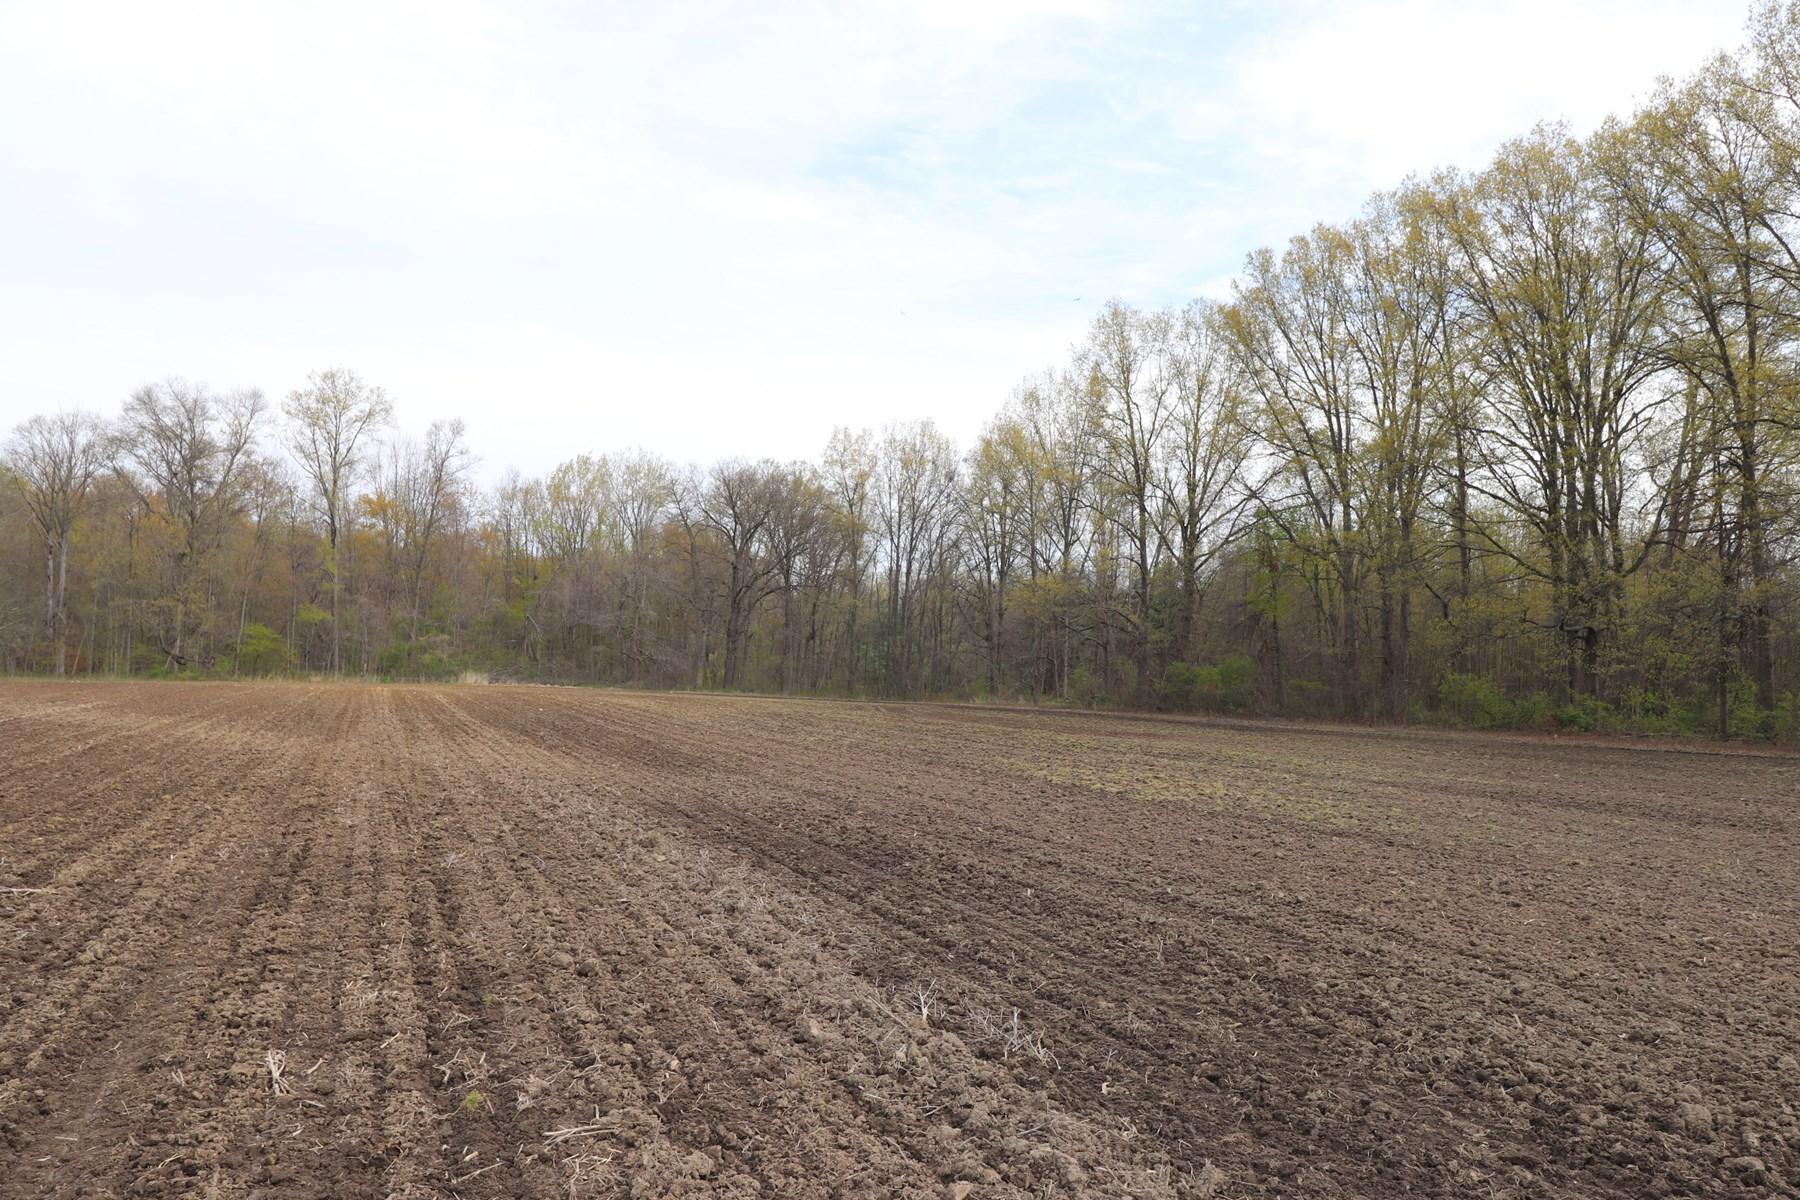 Building Lot, Sunbury Ohio, Delaware County, Buckeye Valley